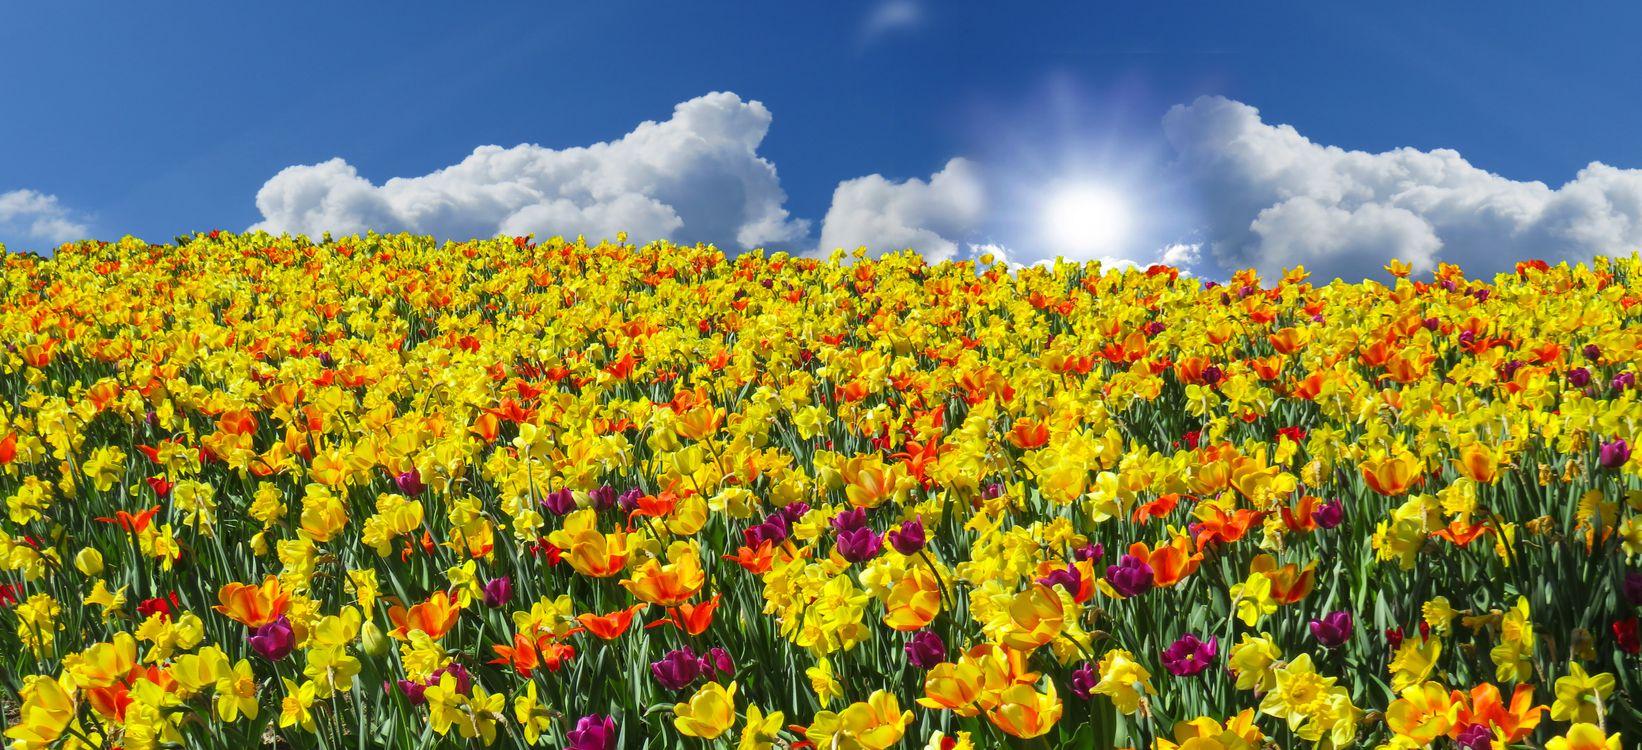 Фото бесплатно поле, тюльпаны, нарциссы, цветы, небо, облака, панорама, флора, цветы